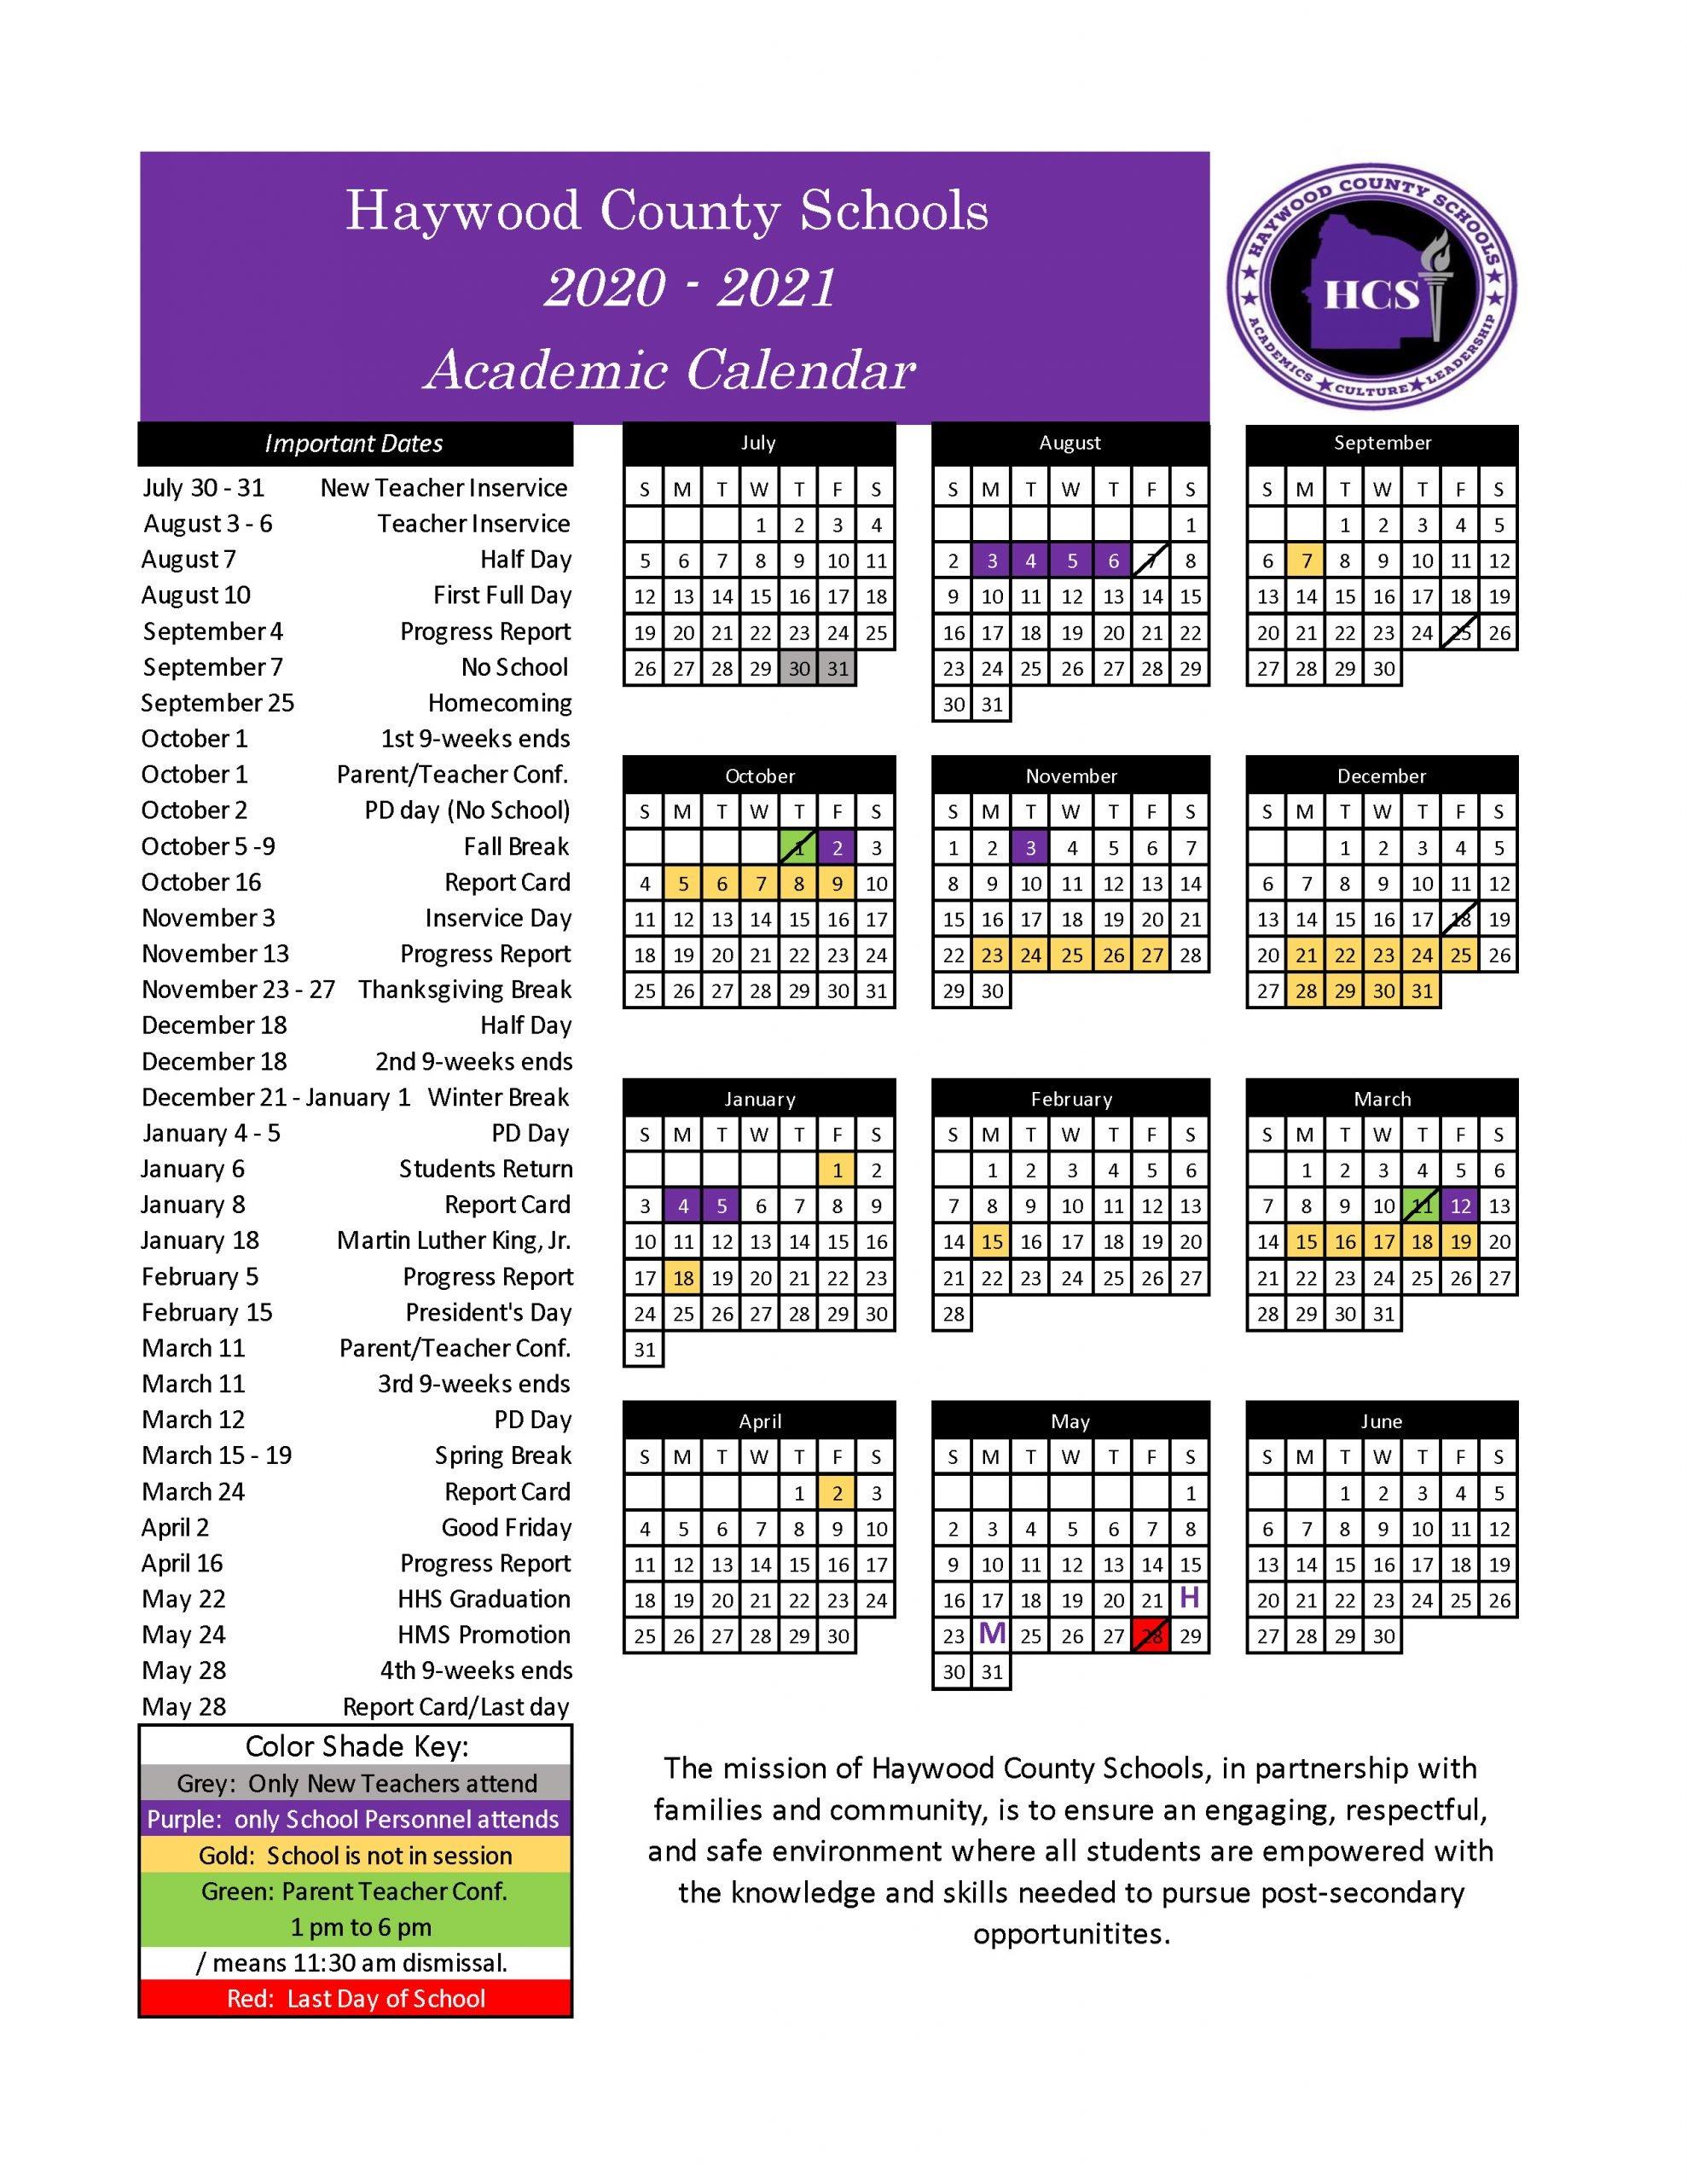 School Calendar | Haywood County Schools Regarding Dare County School Calendar